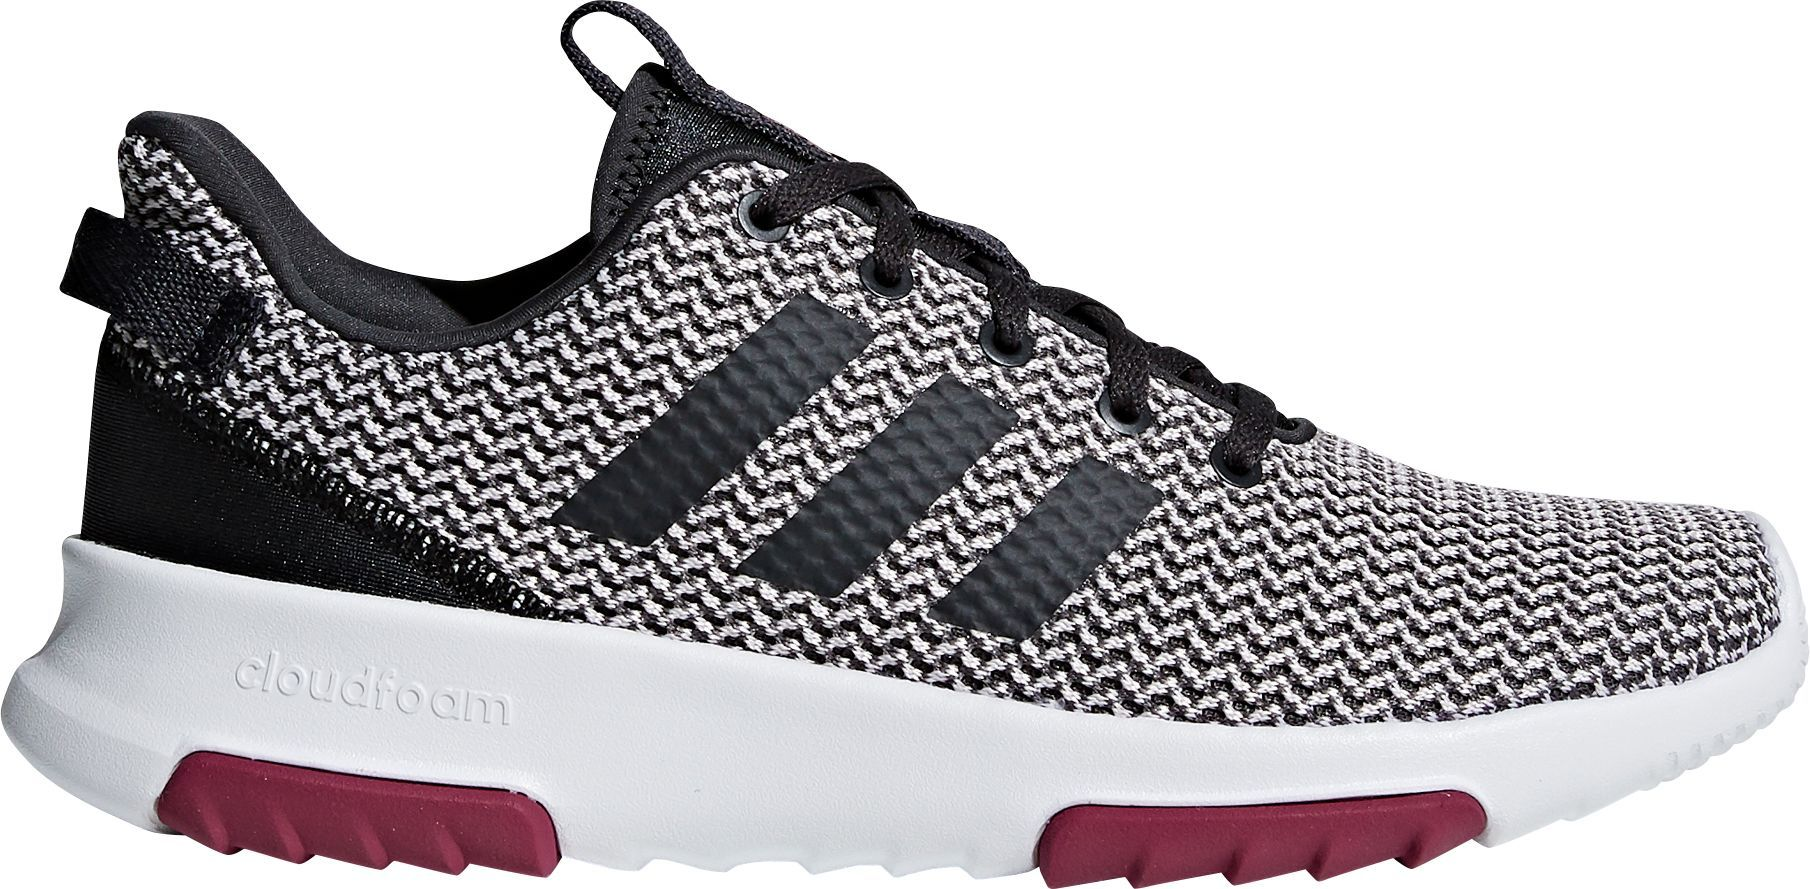 adidas cloudfoam womens trainers